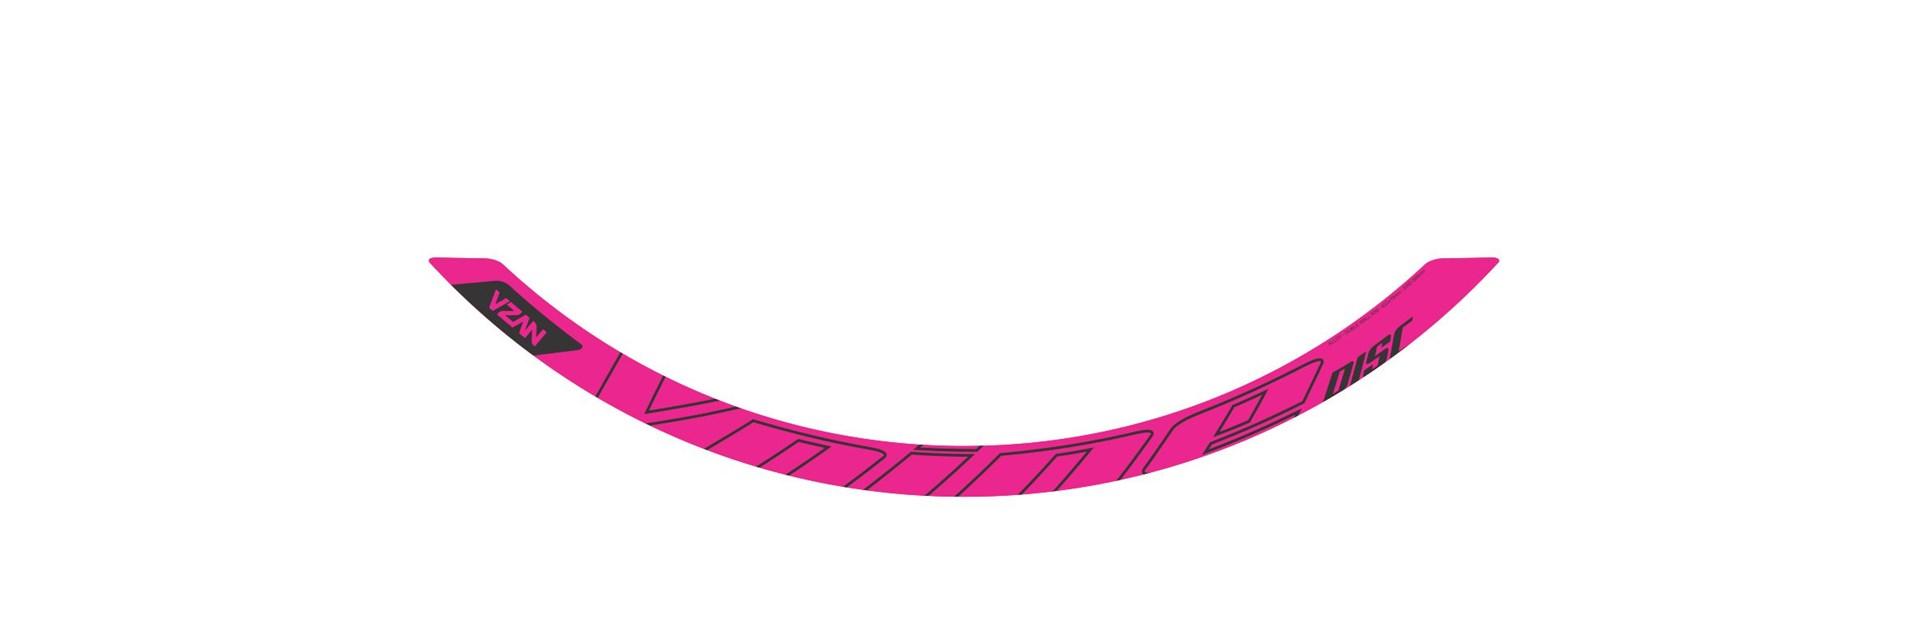 Adesivo Vnine 29 Disc Rosa Neon